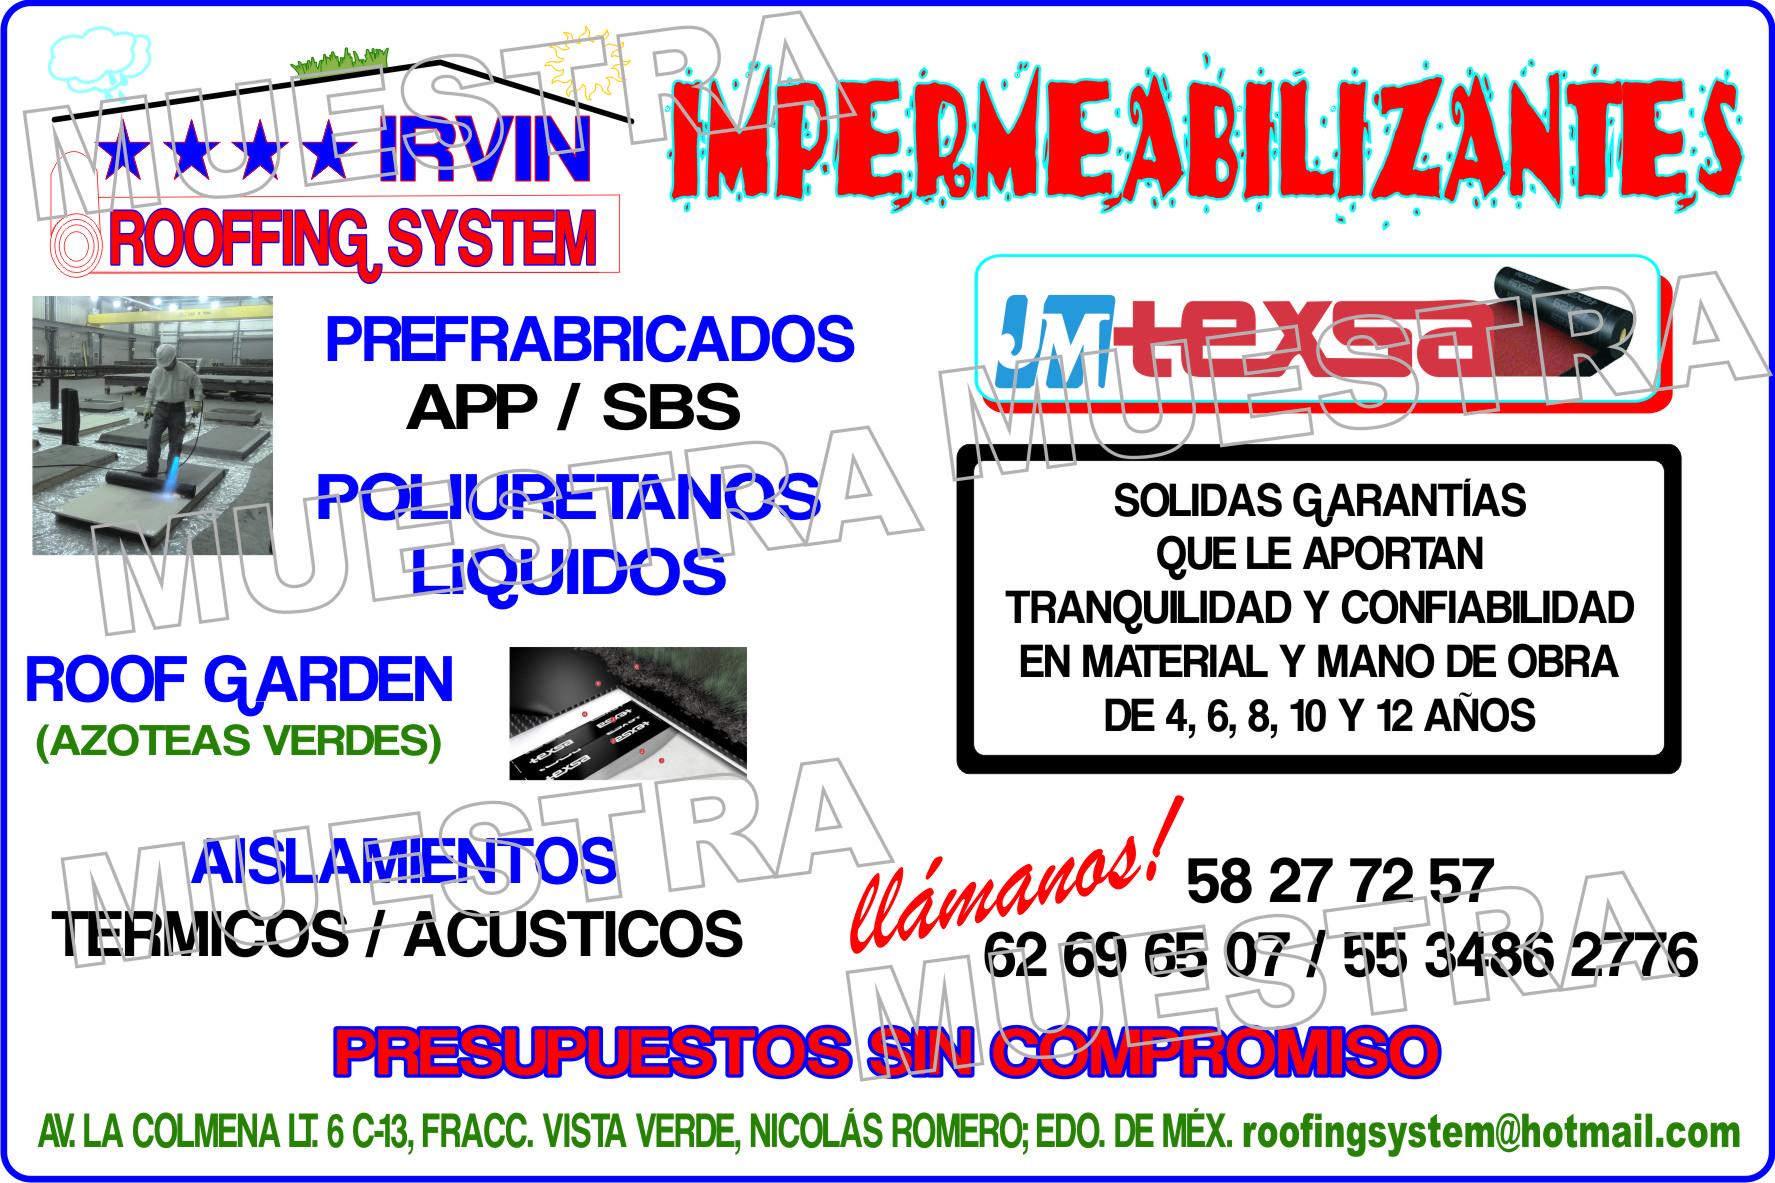 Roofing System Irvin Impermeabilizaciones